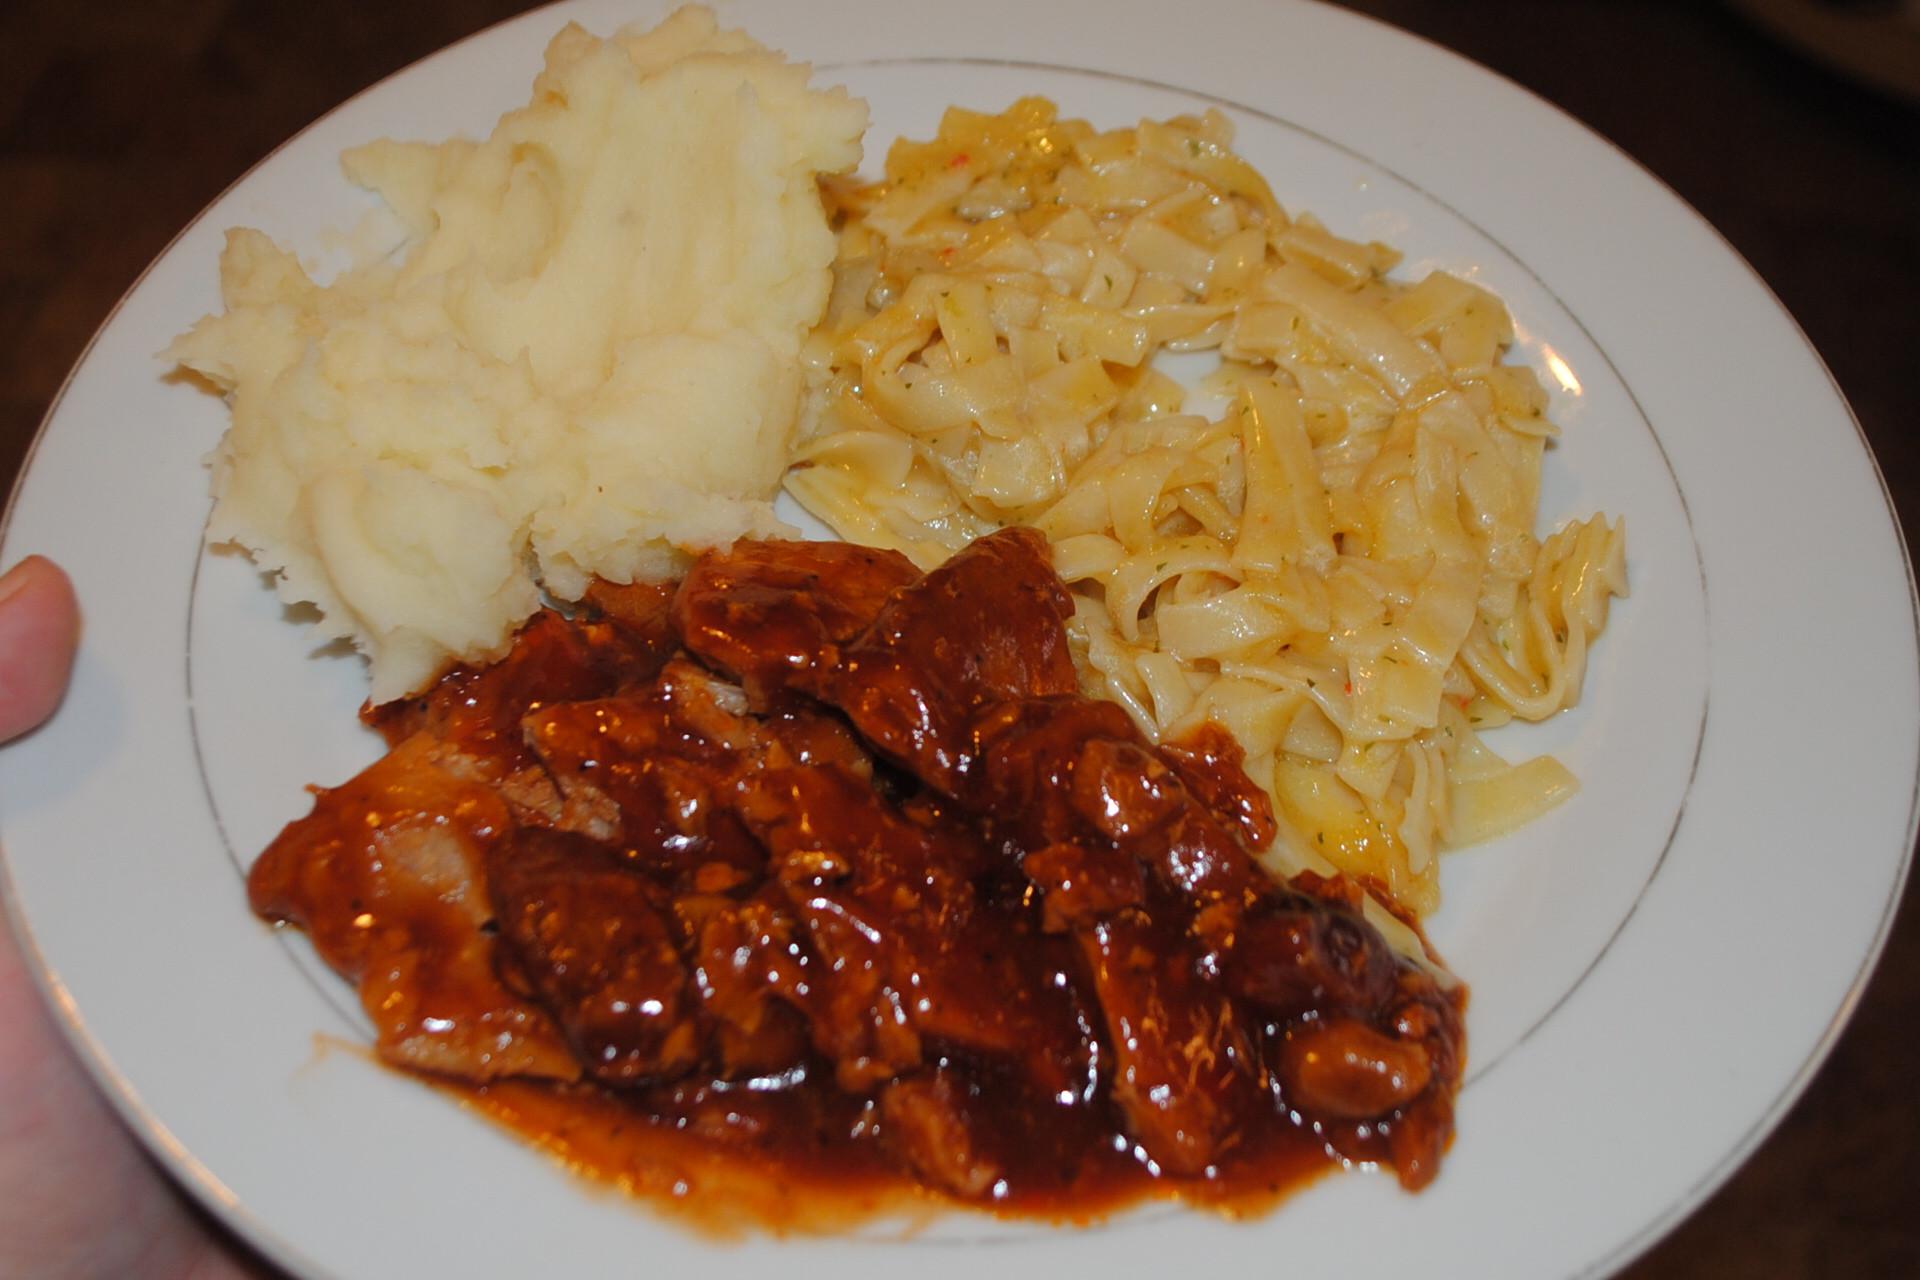 Crock Pot Bbq Pork Chops  MELT IN YOUR MOUTH CROCK POT BBQ PORK CHOPS